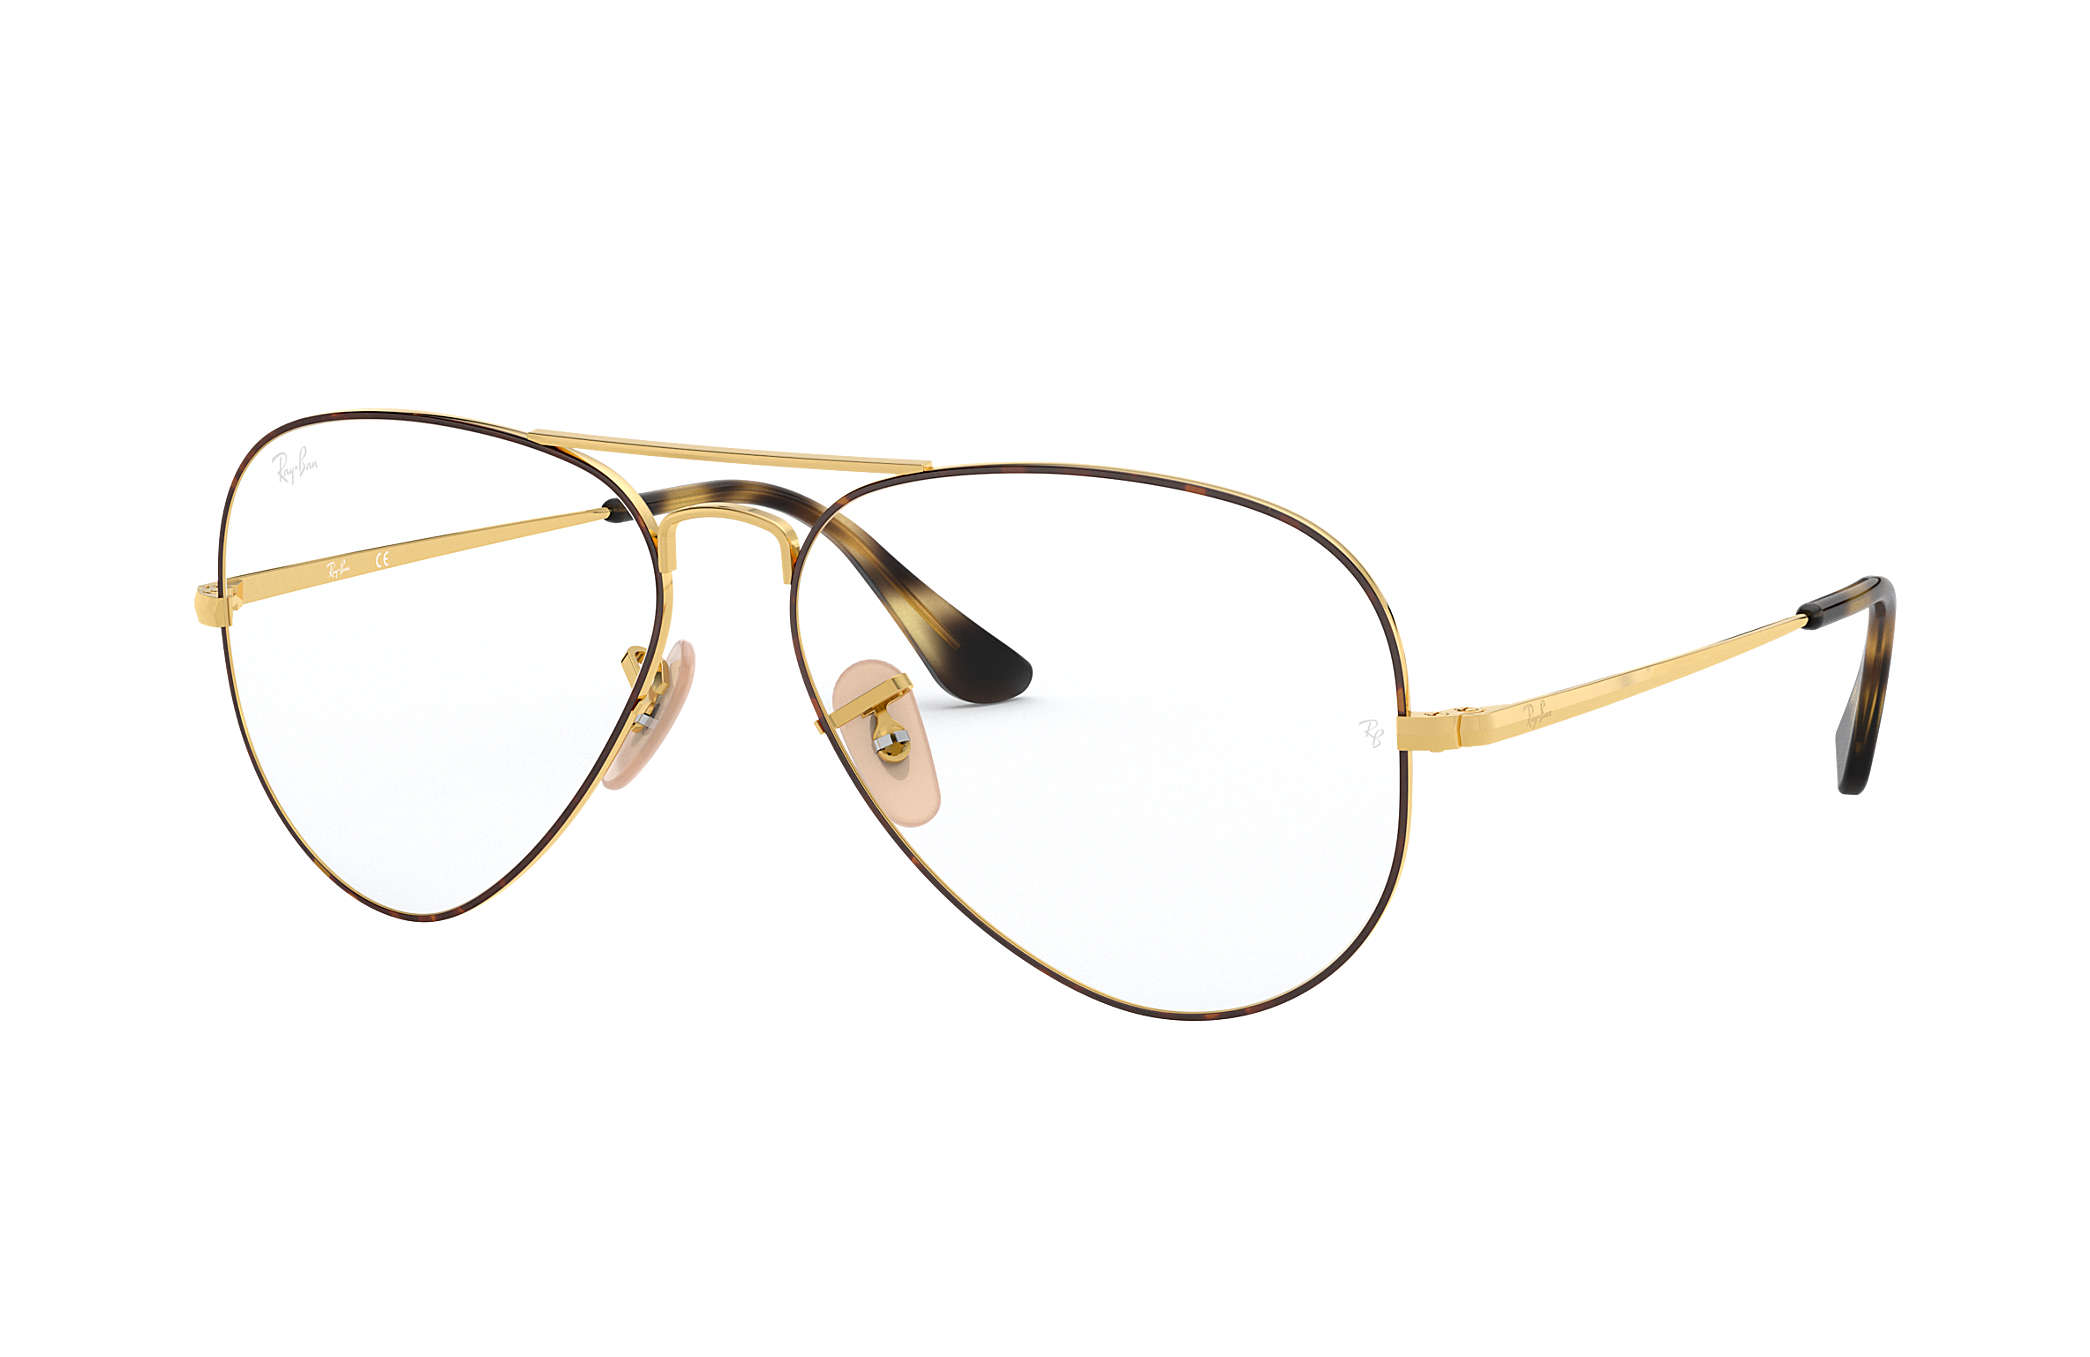 Ray-Ban prescription glasses Aviator Optics RB6489 Tortoise - Metal ...